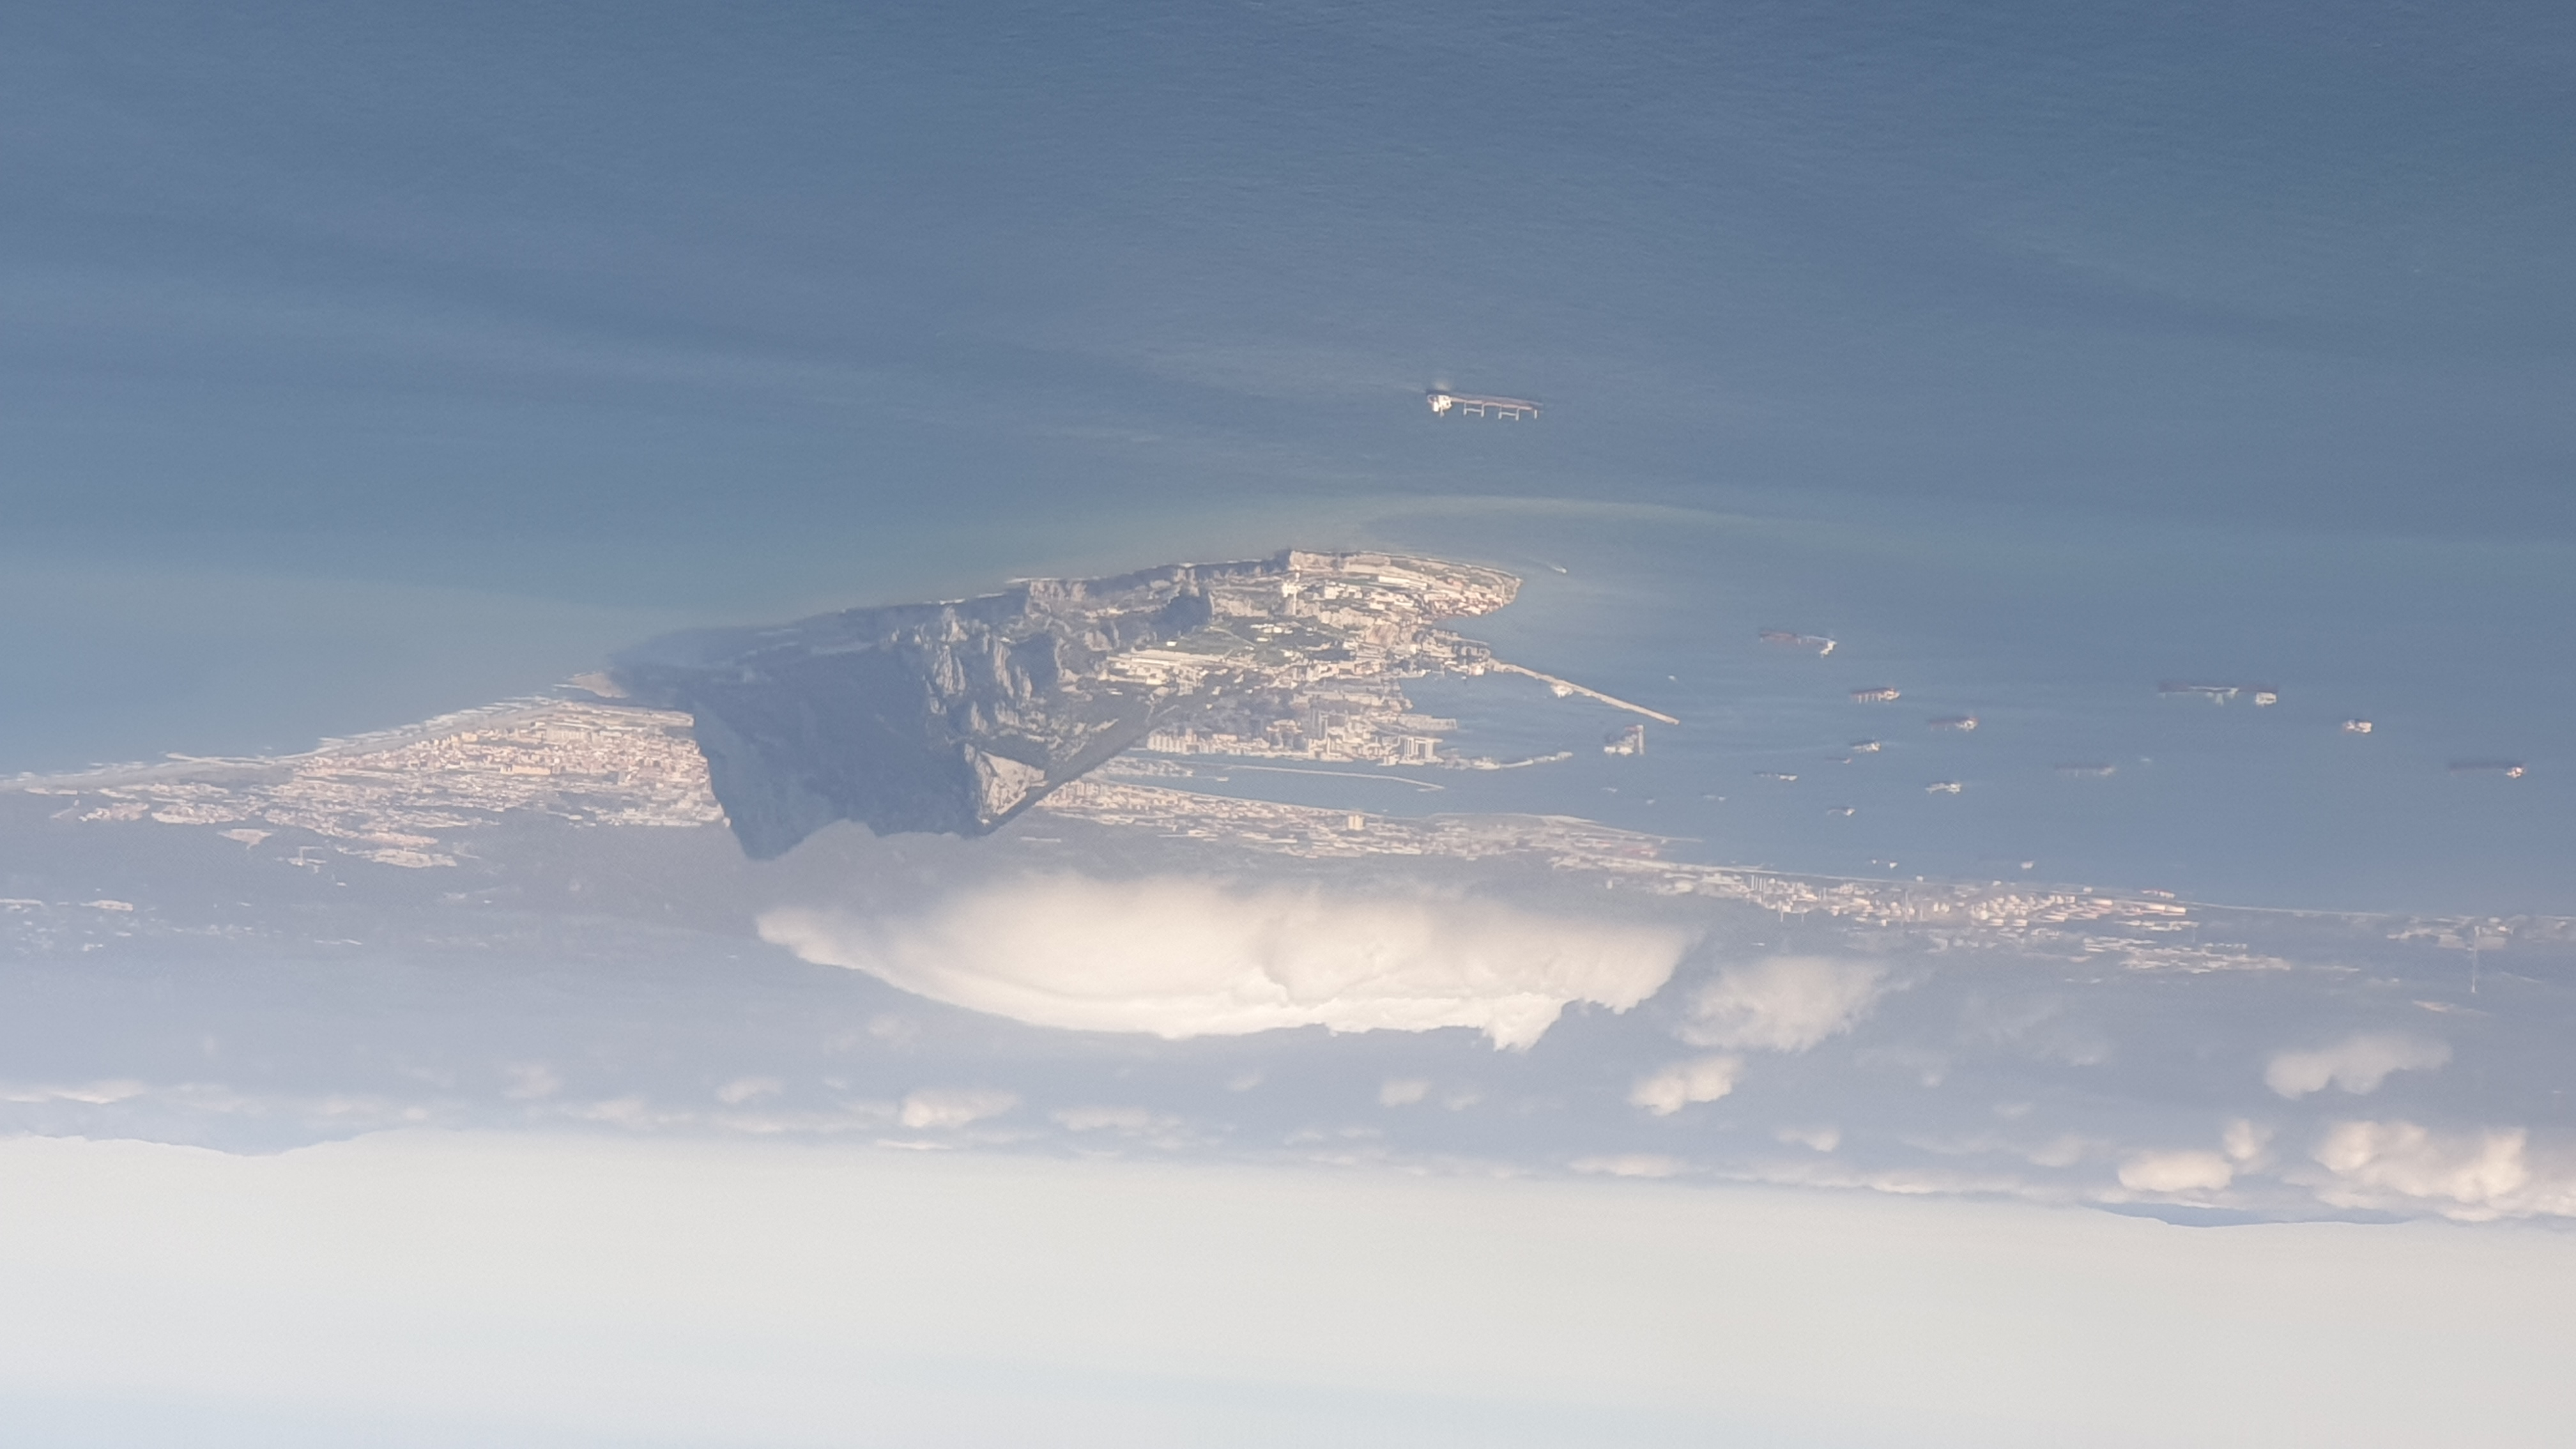 Gibraltar - Levanter cloud over The Rock - Aerial View 2 (Feb 2021).jpg